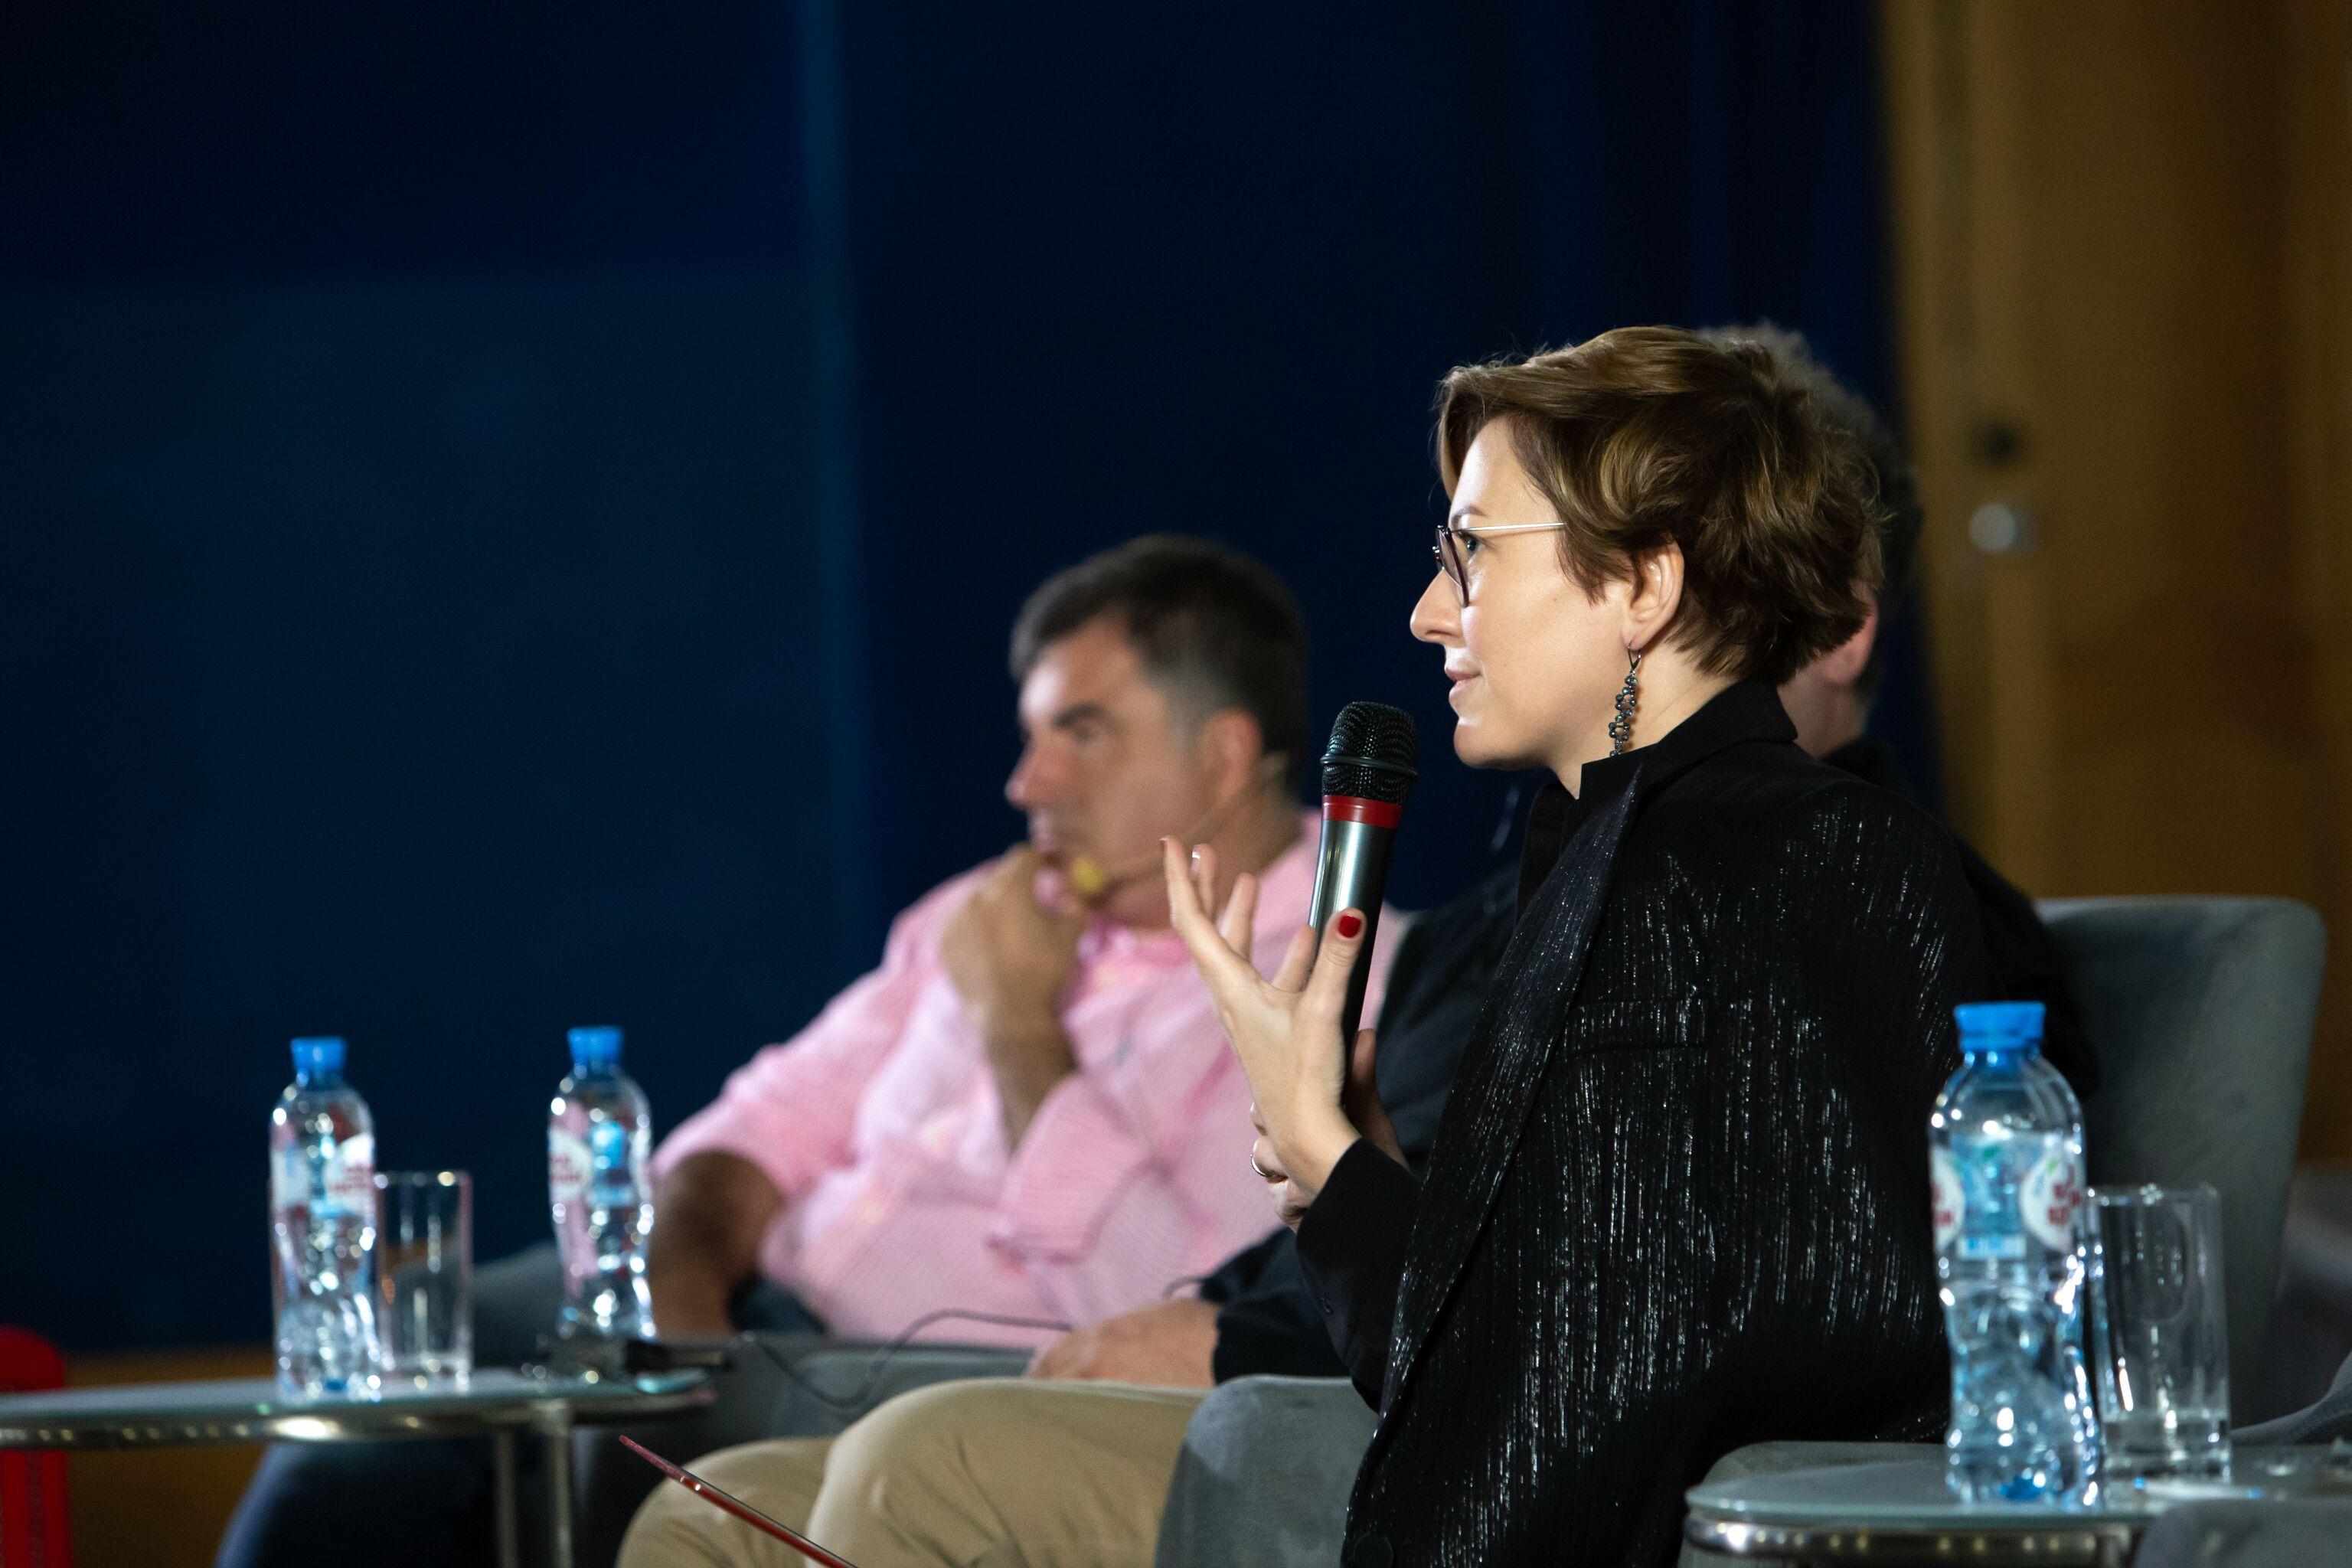 Константин Новоселов, Алиса Прудникова; это фото и далее предоставлены ZOOM ZOOM Family